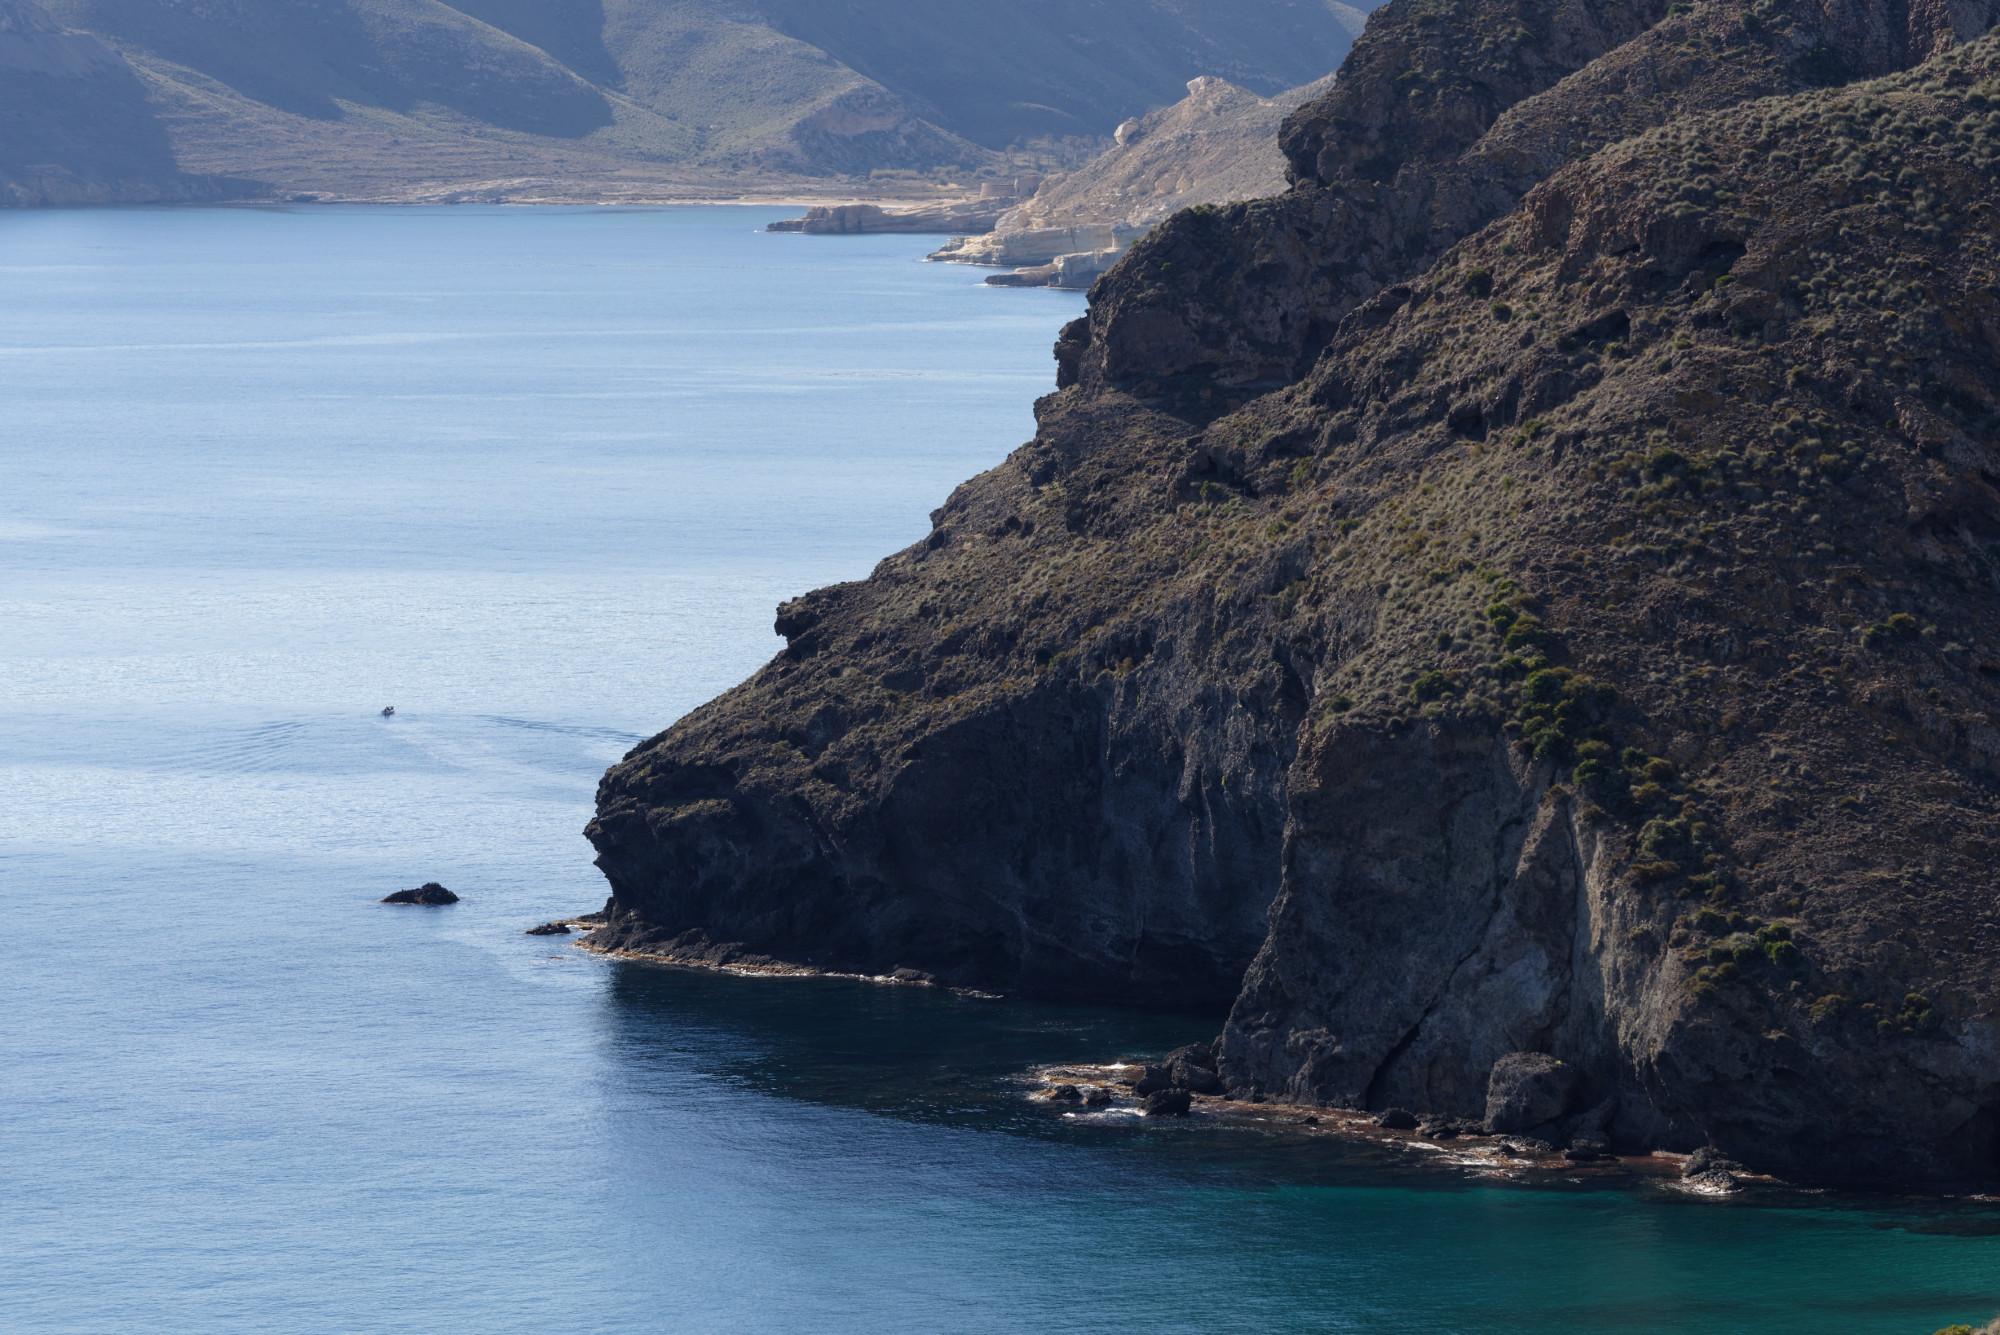 171213-Marche Las Negras-Cala San Pedro-Las Negras (26) (Cabo de Gata-Andalousie)